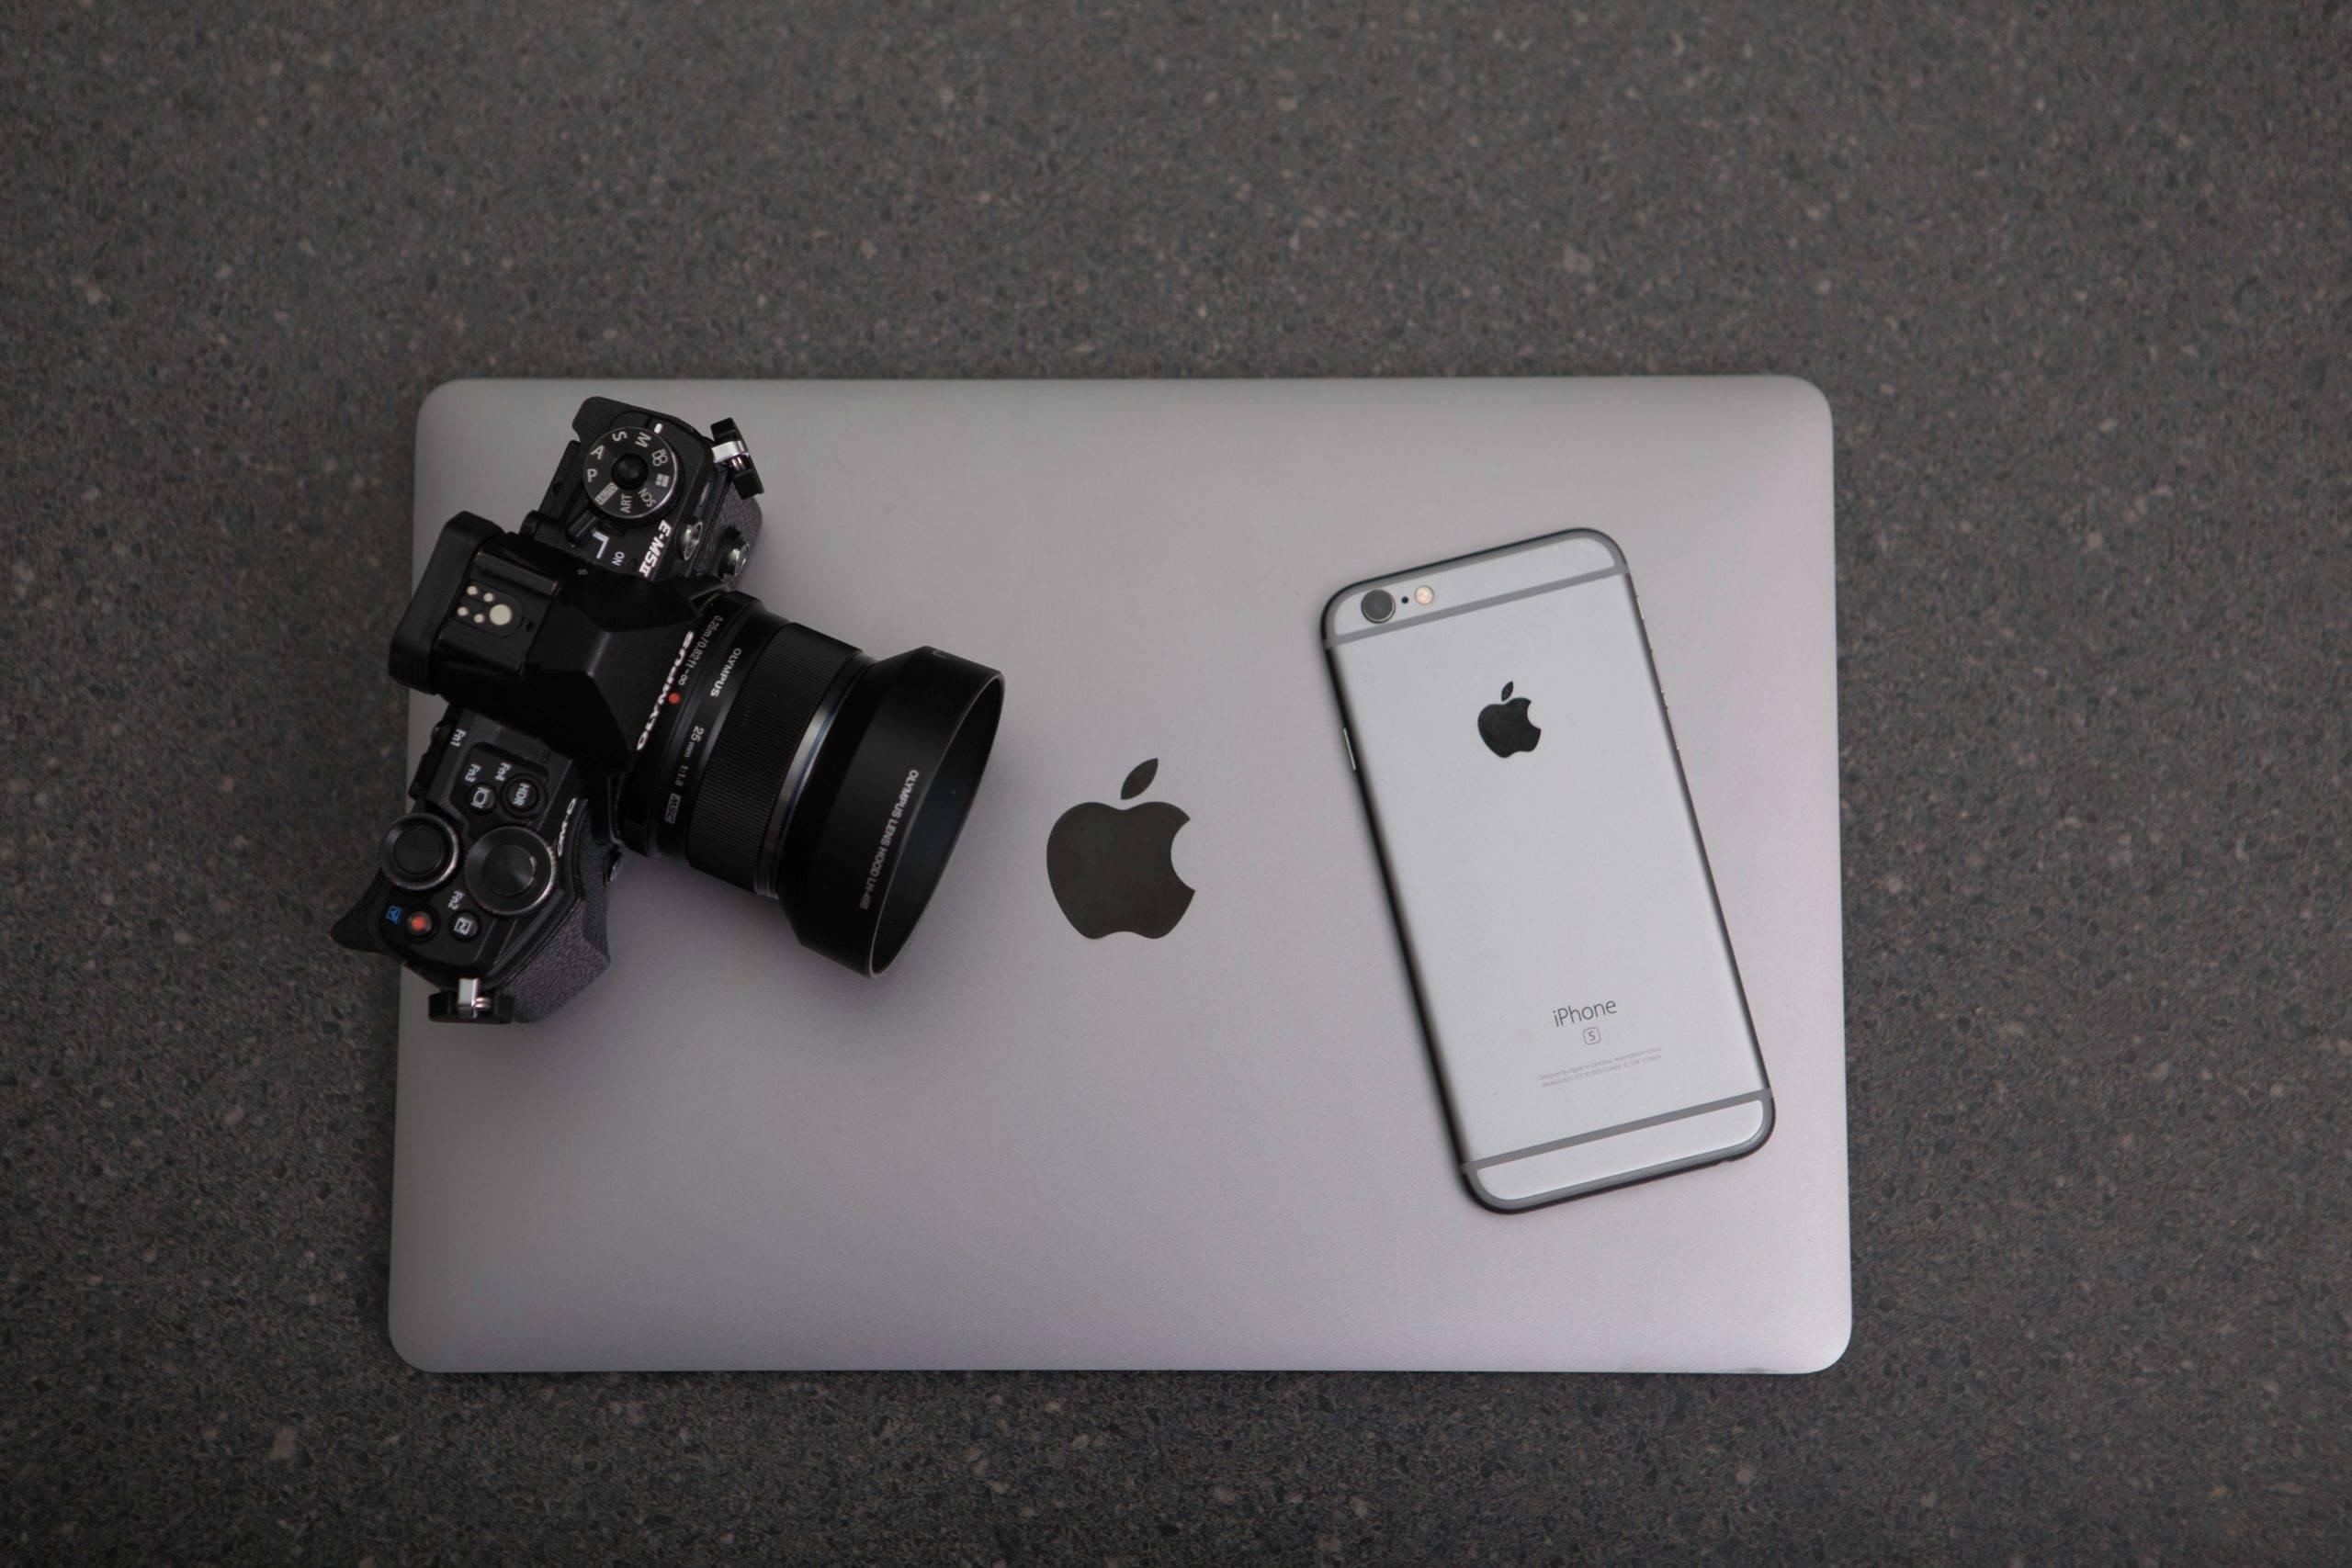 Apple Releasing iOS 13.2 Developer Beta